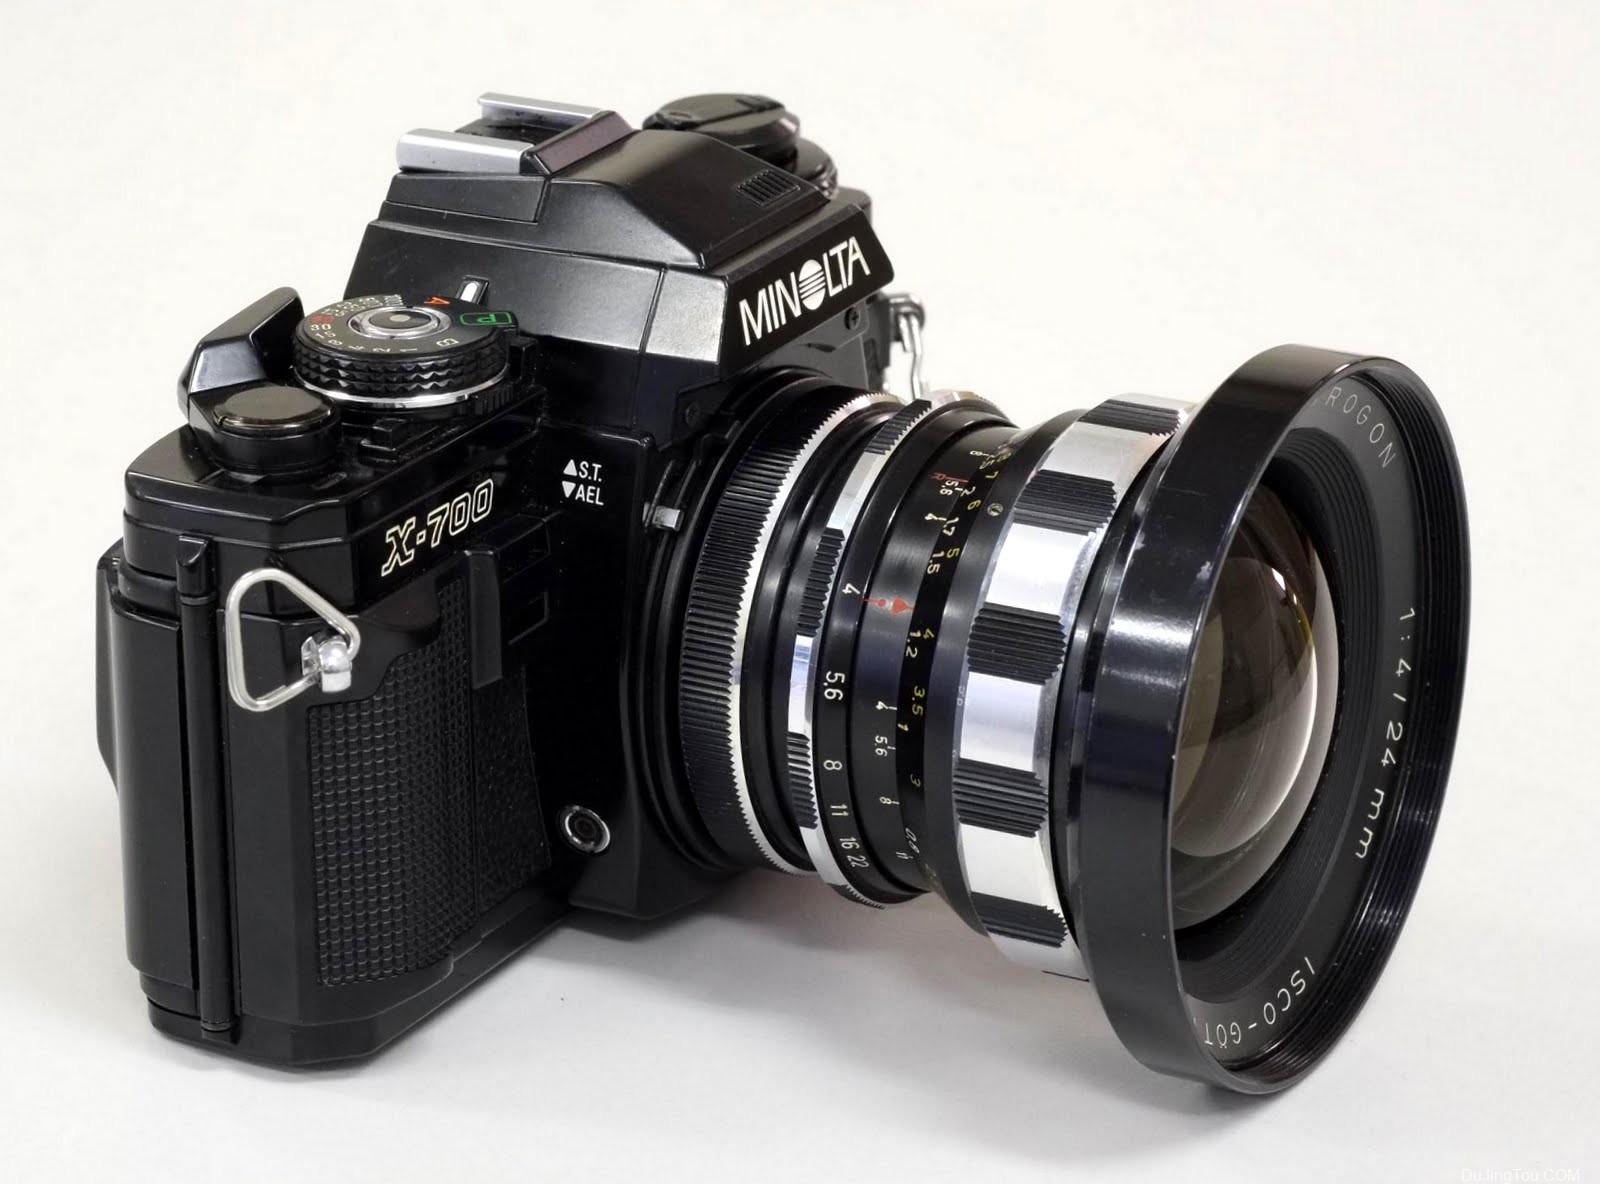 Isco-Göttingen WESTROGON 24mm F4 (M42)镜头评测及样片